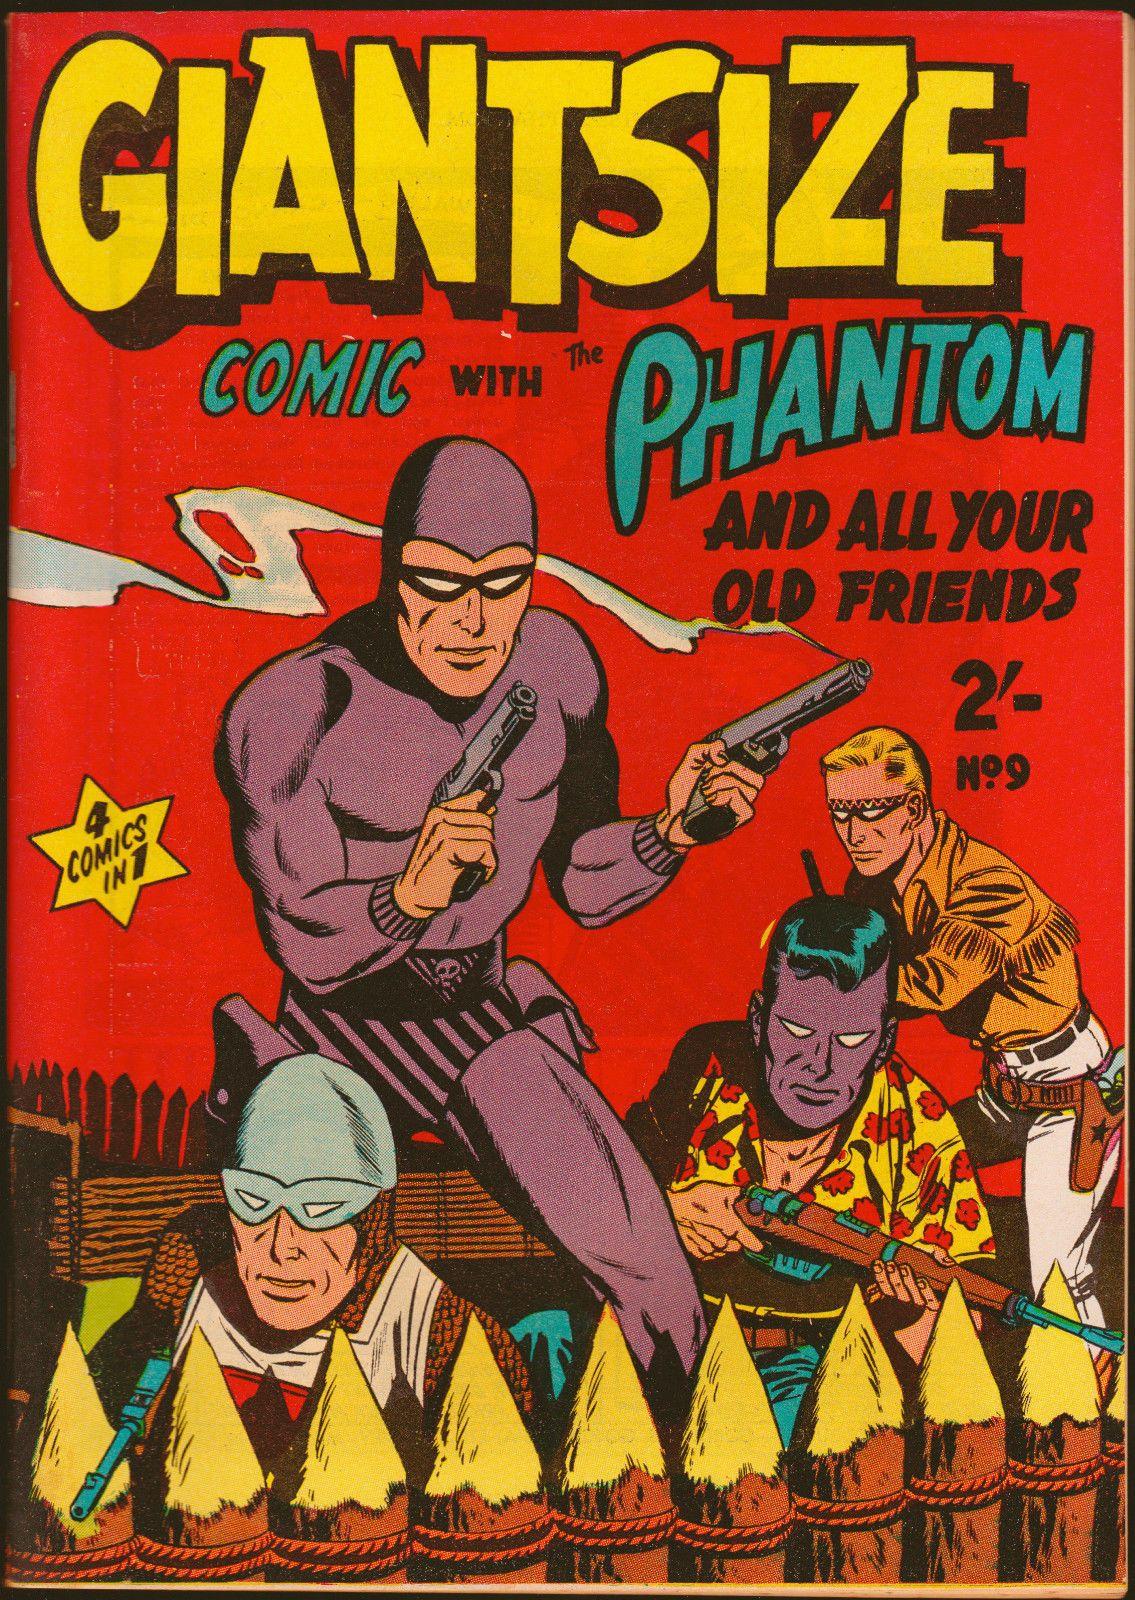 from Omari the phantom comic book character gay